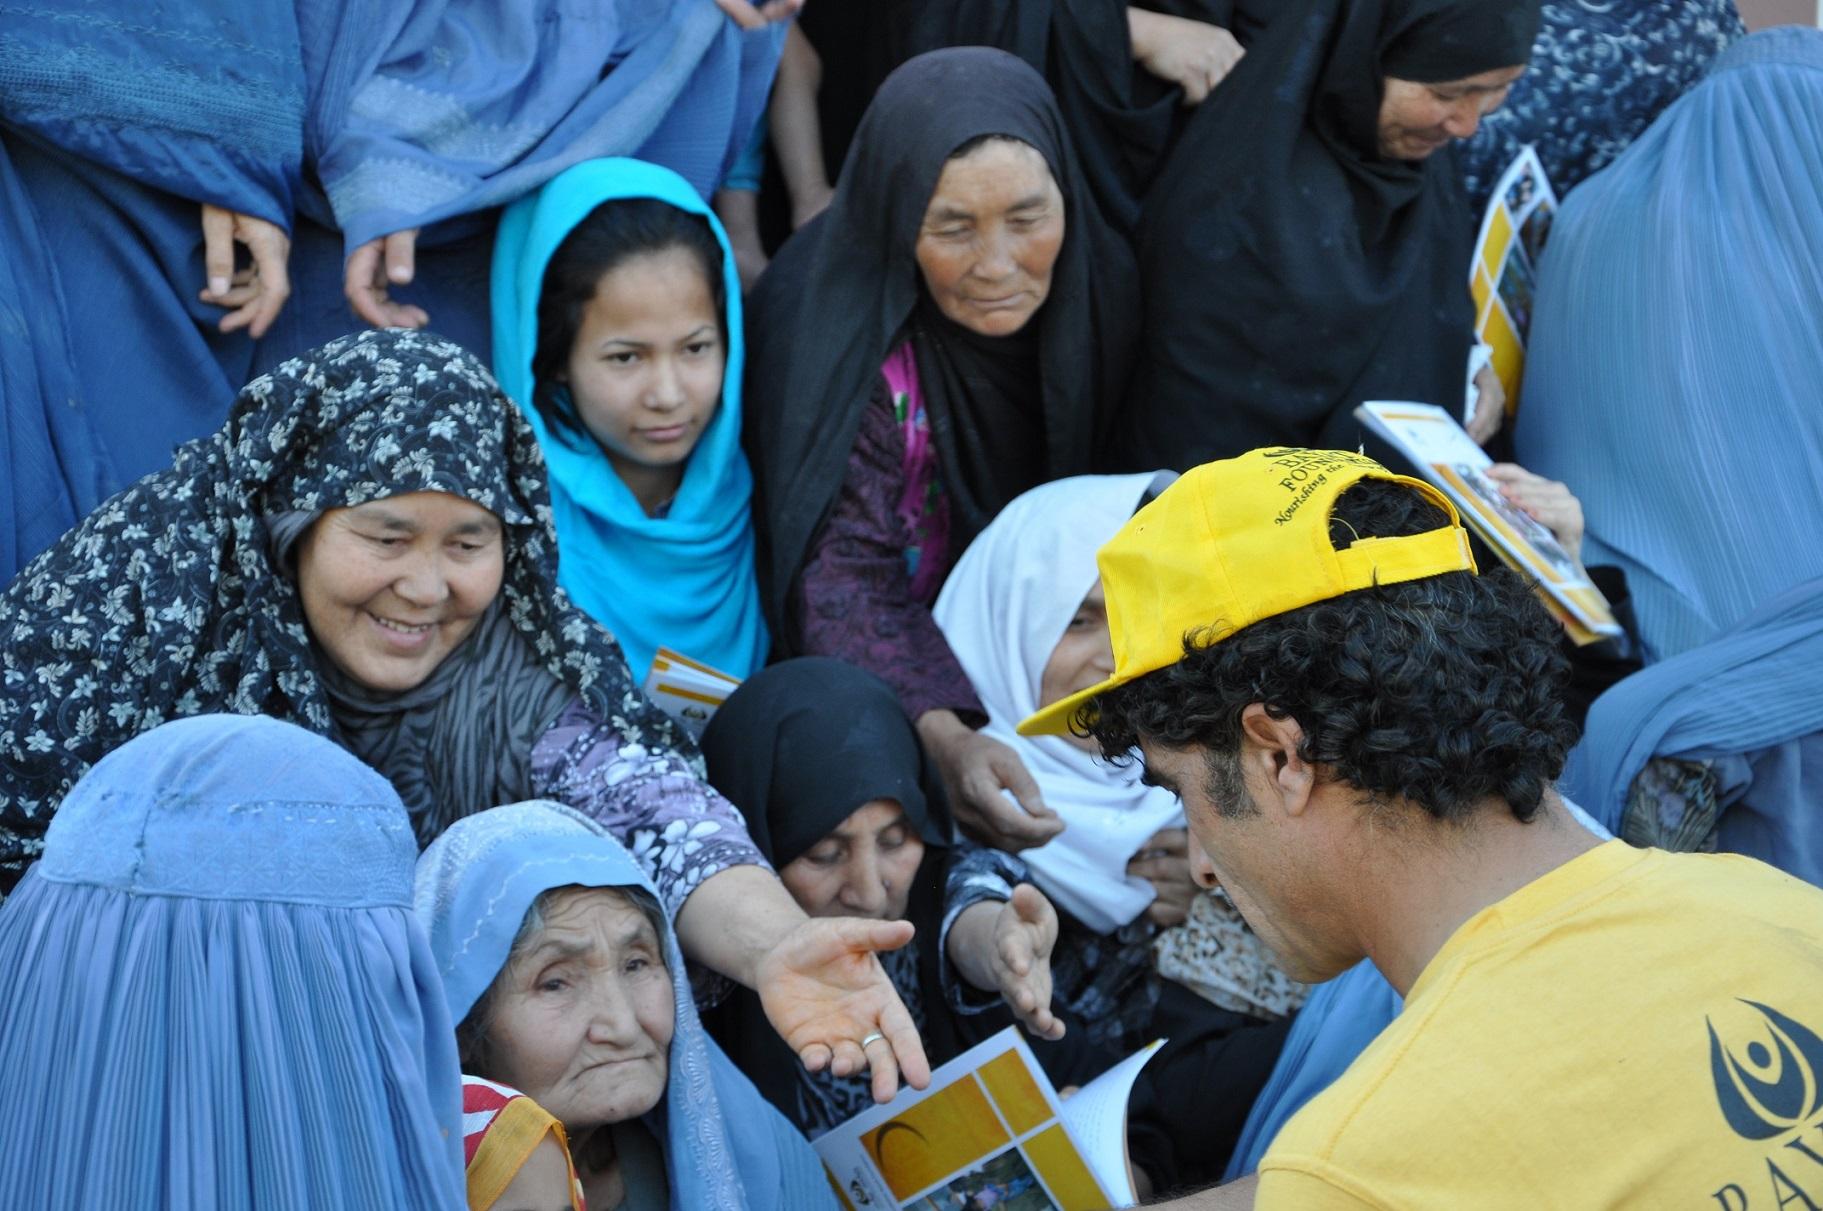 latest news bayat foundation part  ramadan food drive in kabul s char qala e card area